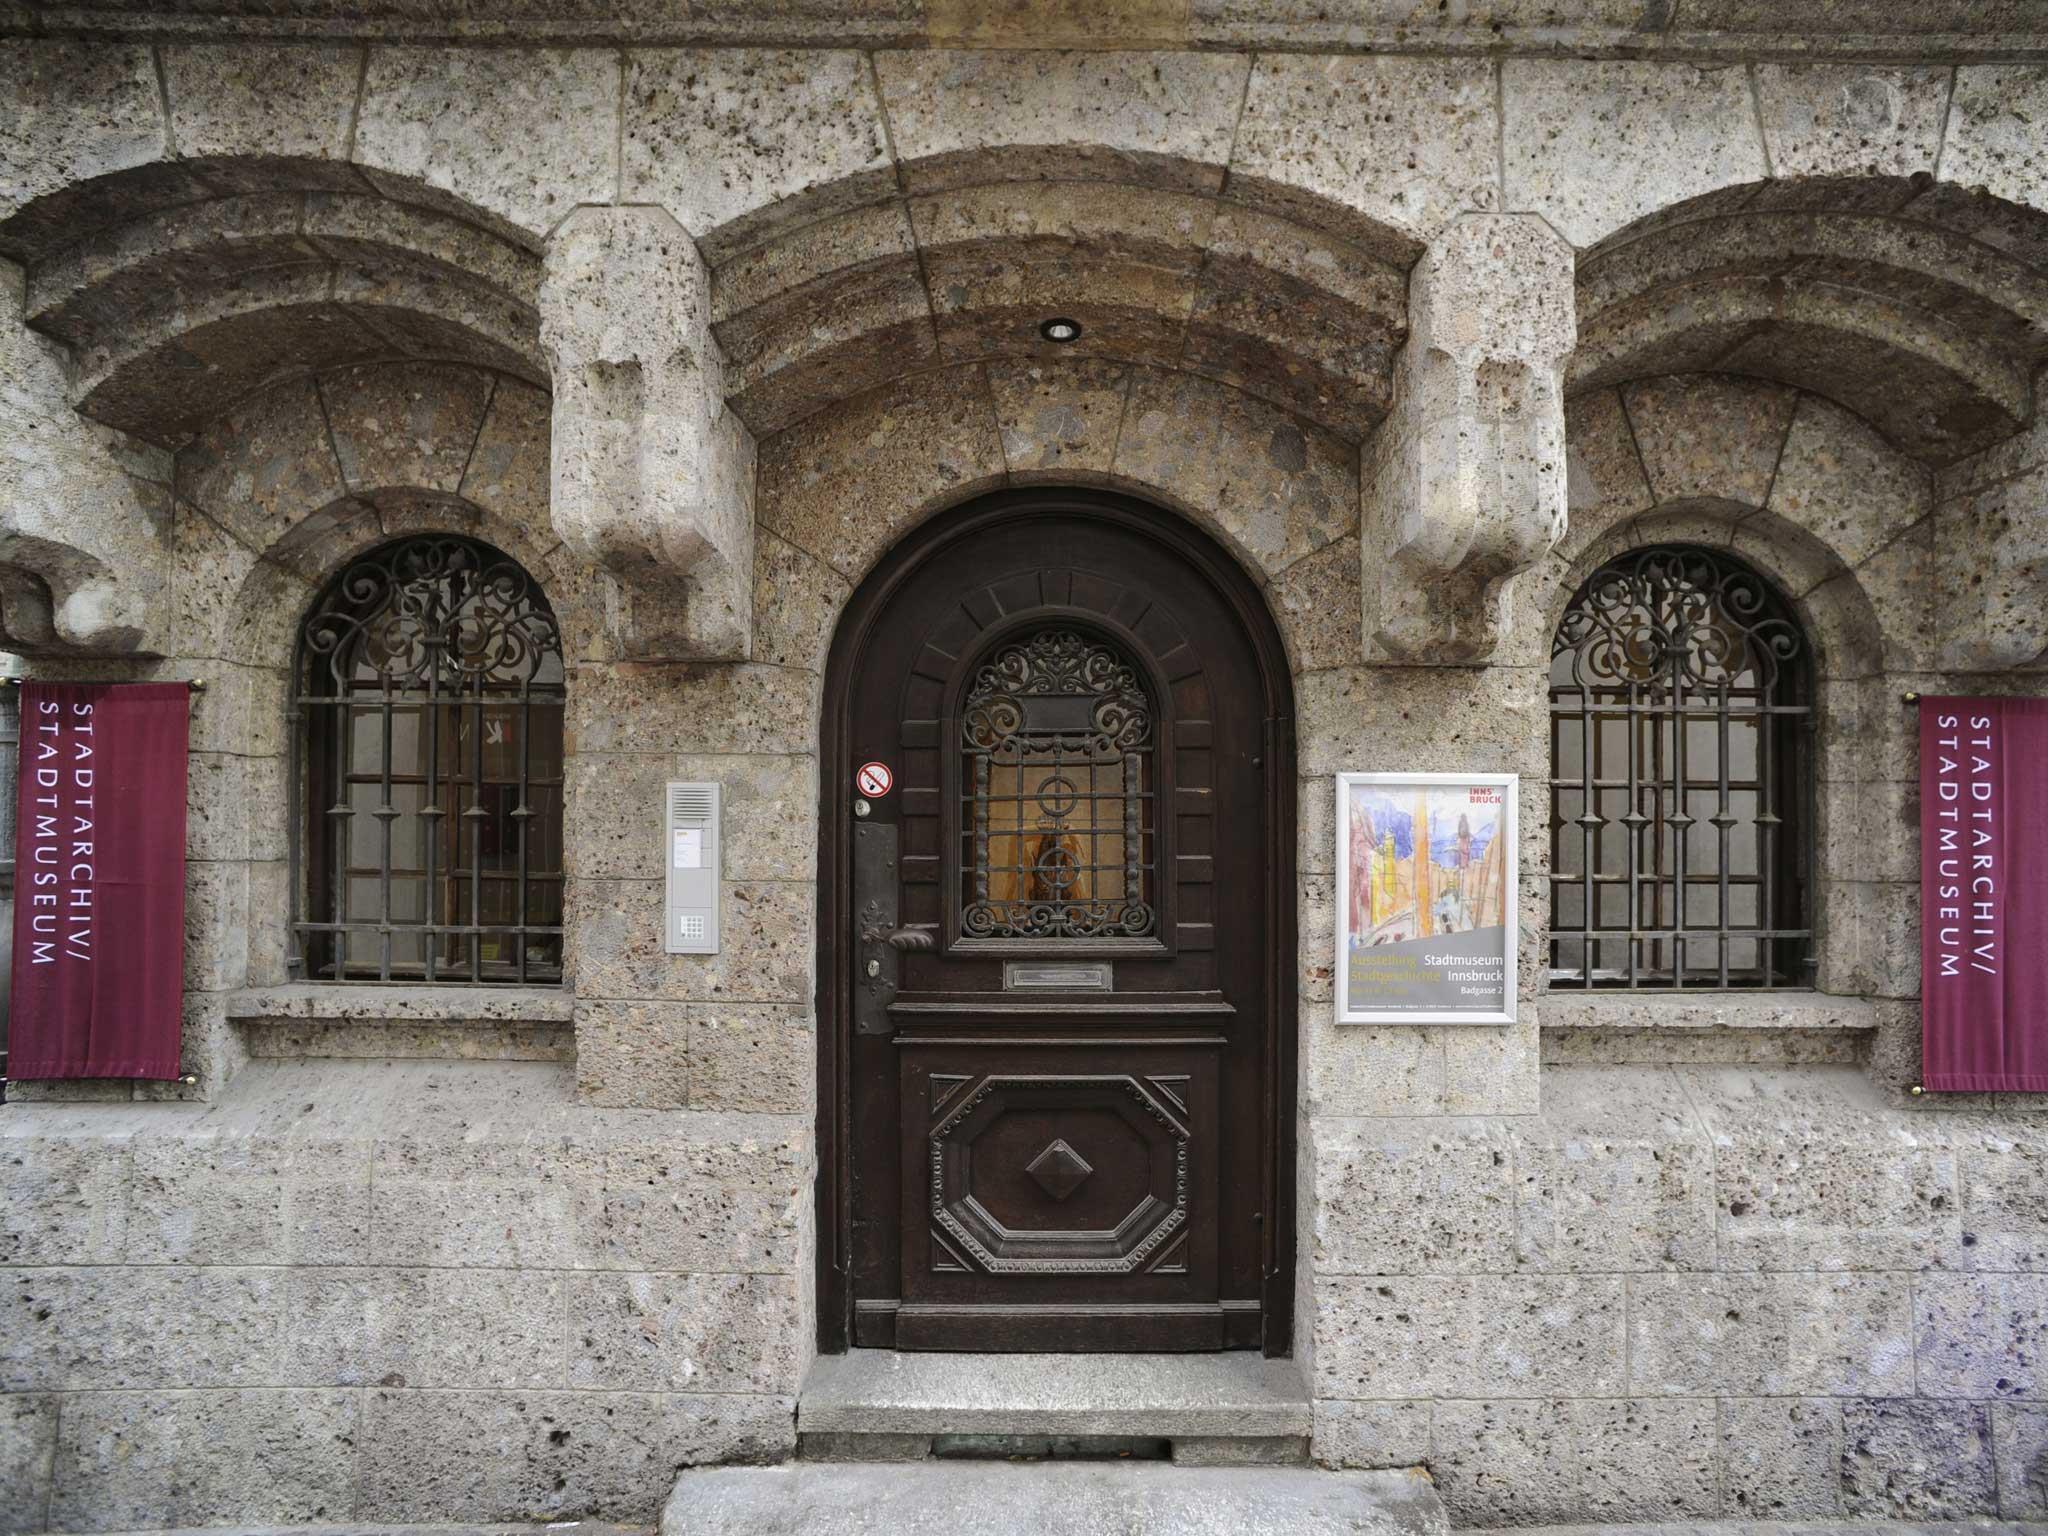 Stadtarchiv/Stadtmuseum